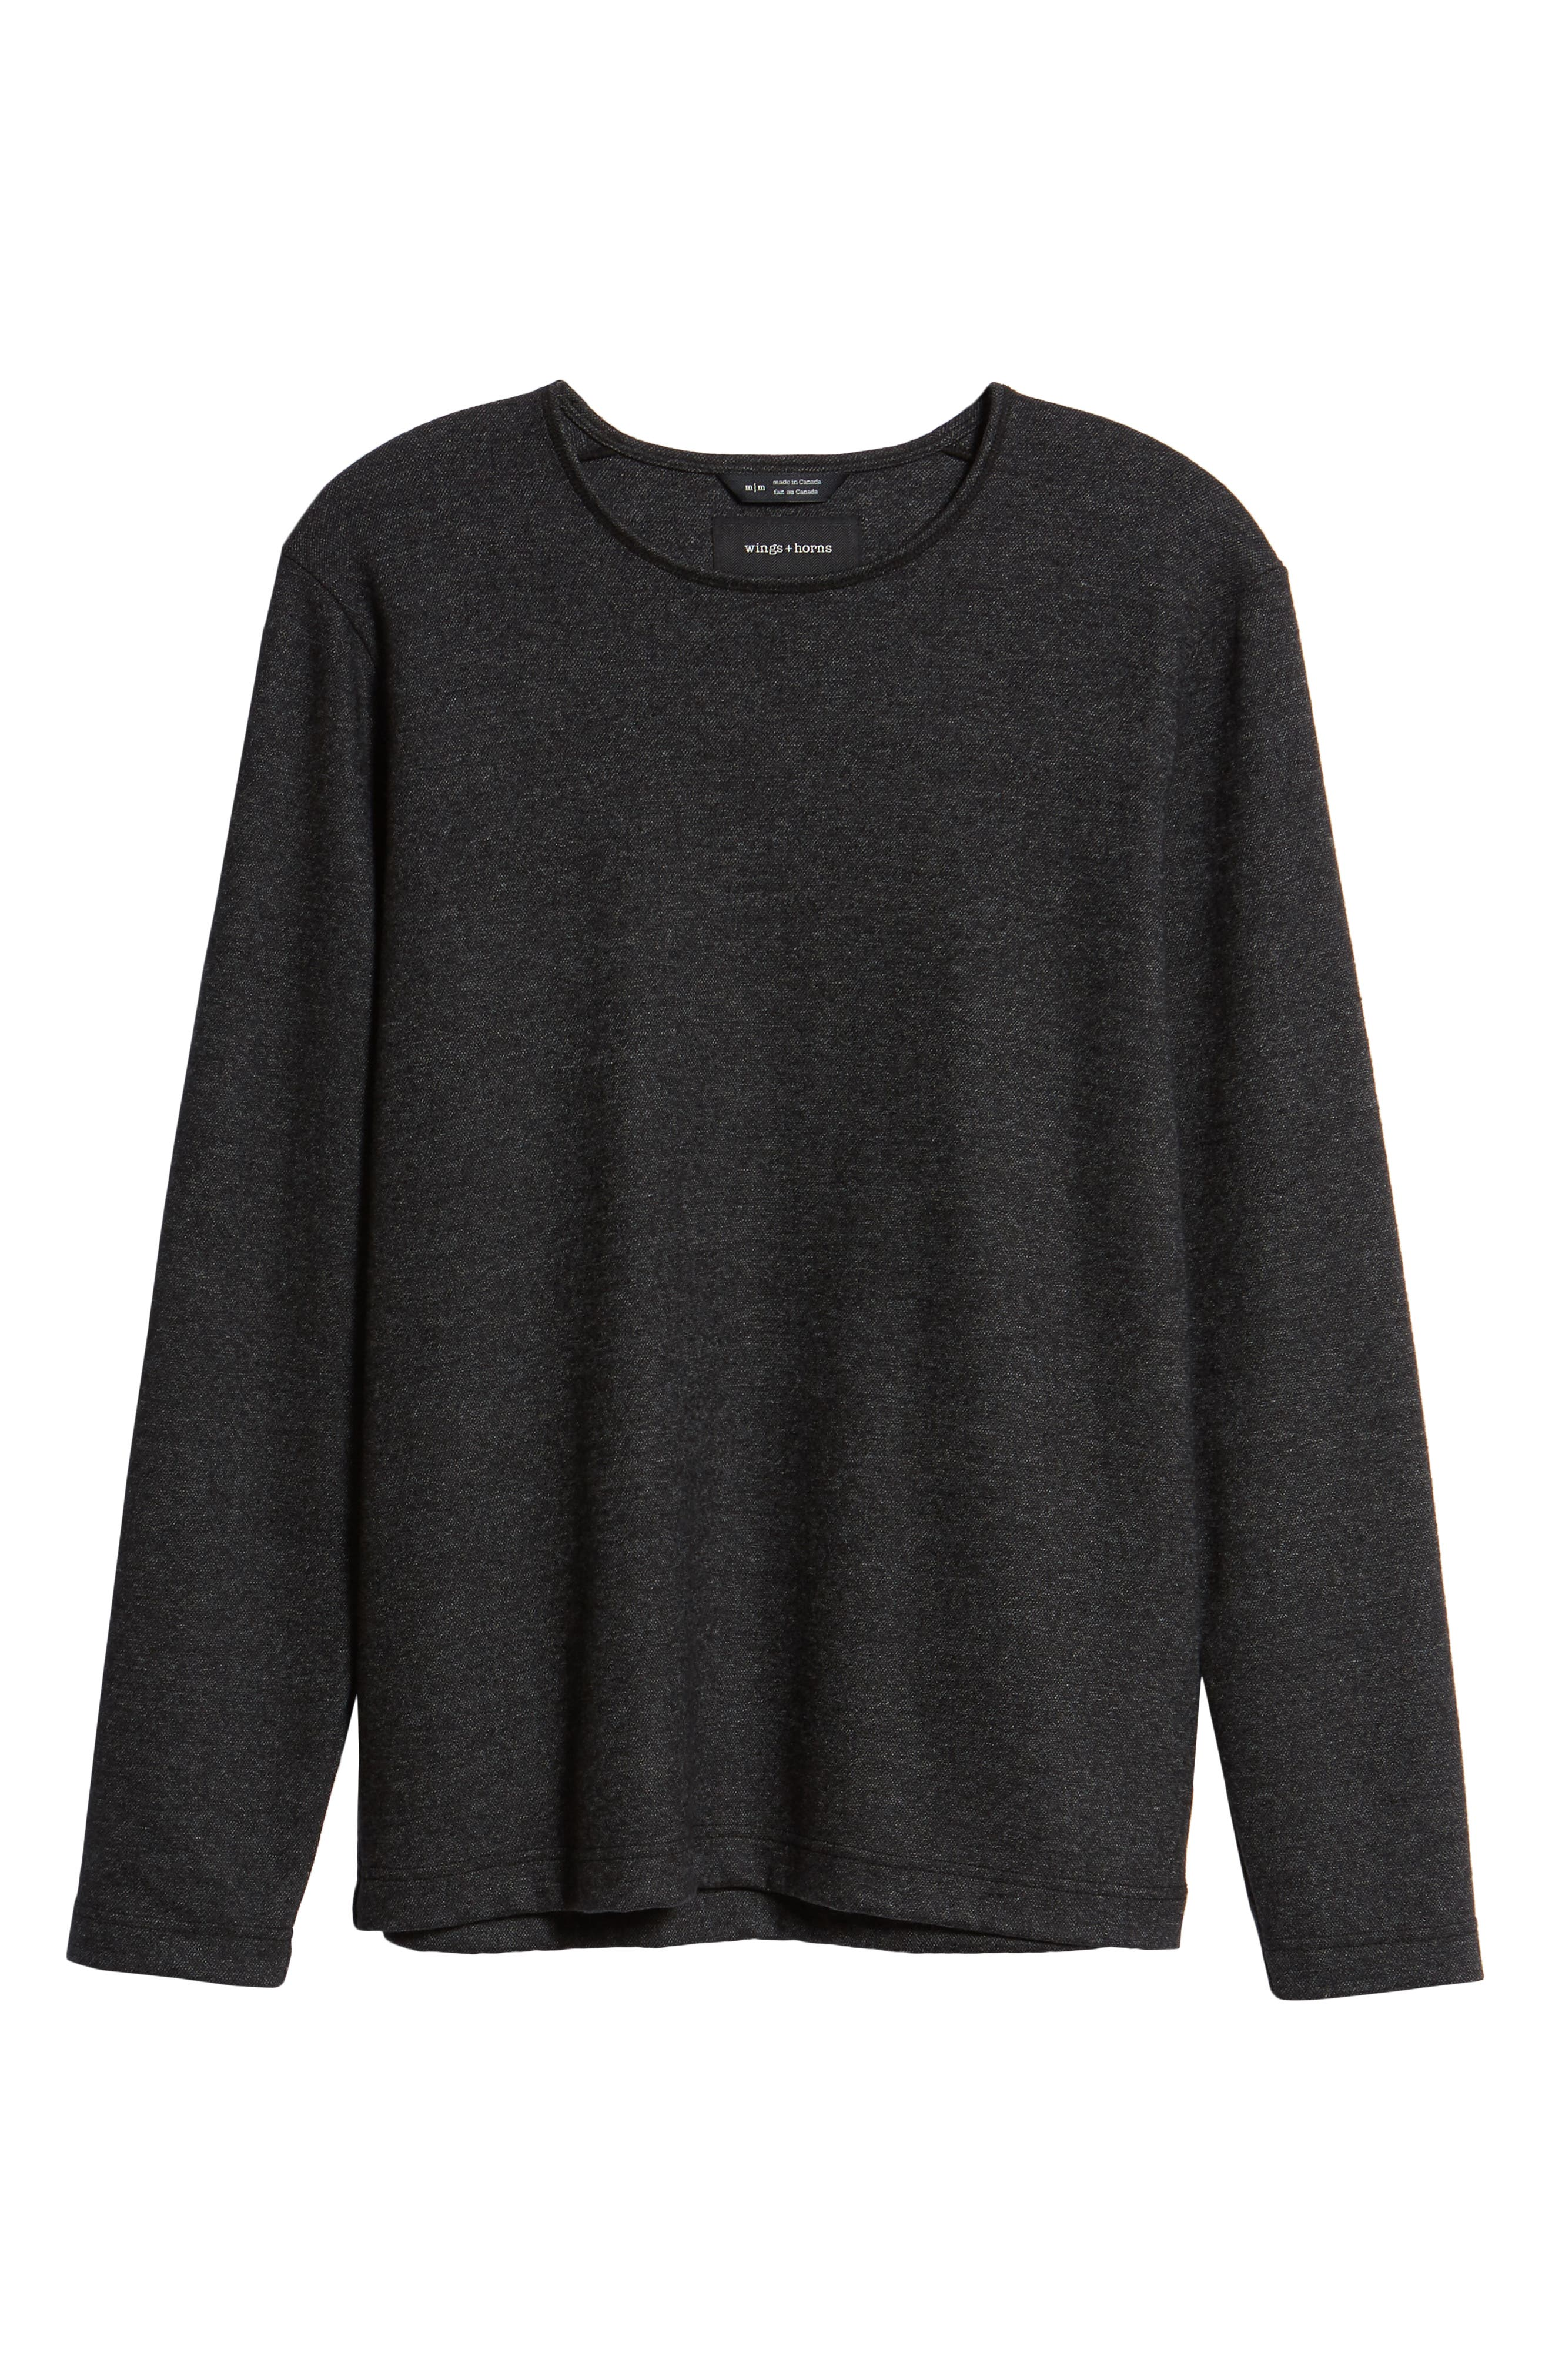 Crewneck Wool Blend Sweater,                             Alternate thumbnail 6, color,                             MEDIUM BLACK